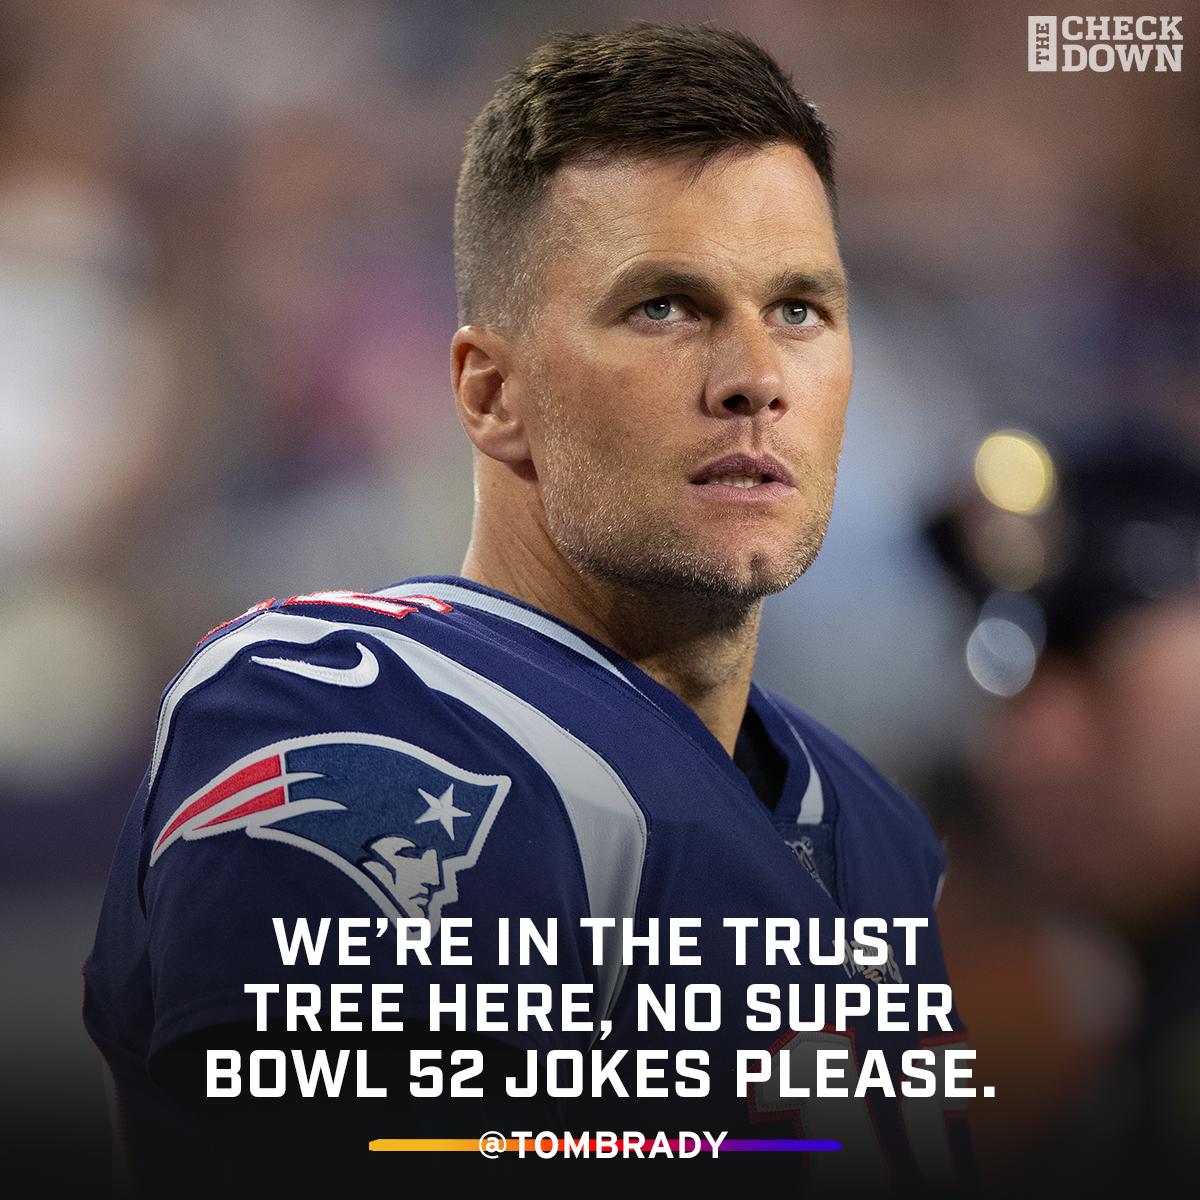 Brady_Tweet_4.png